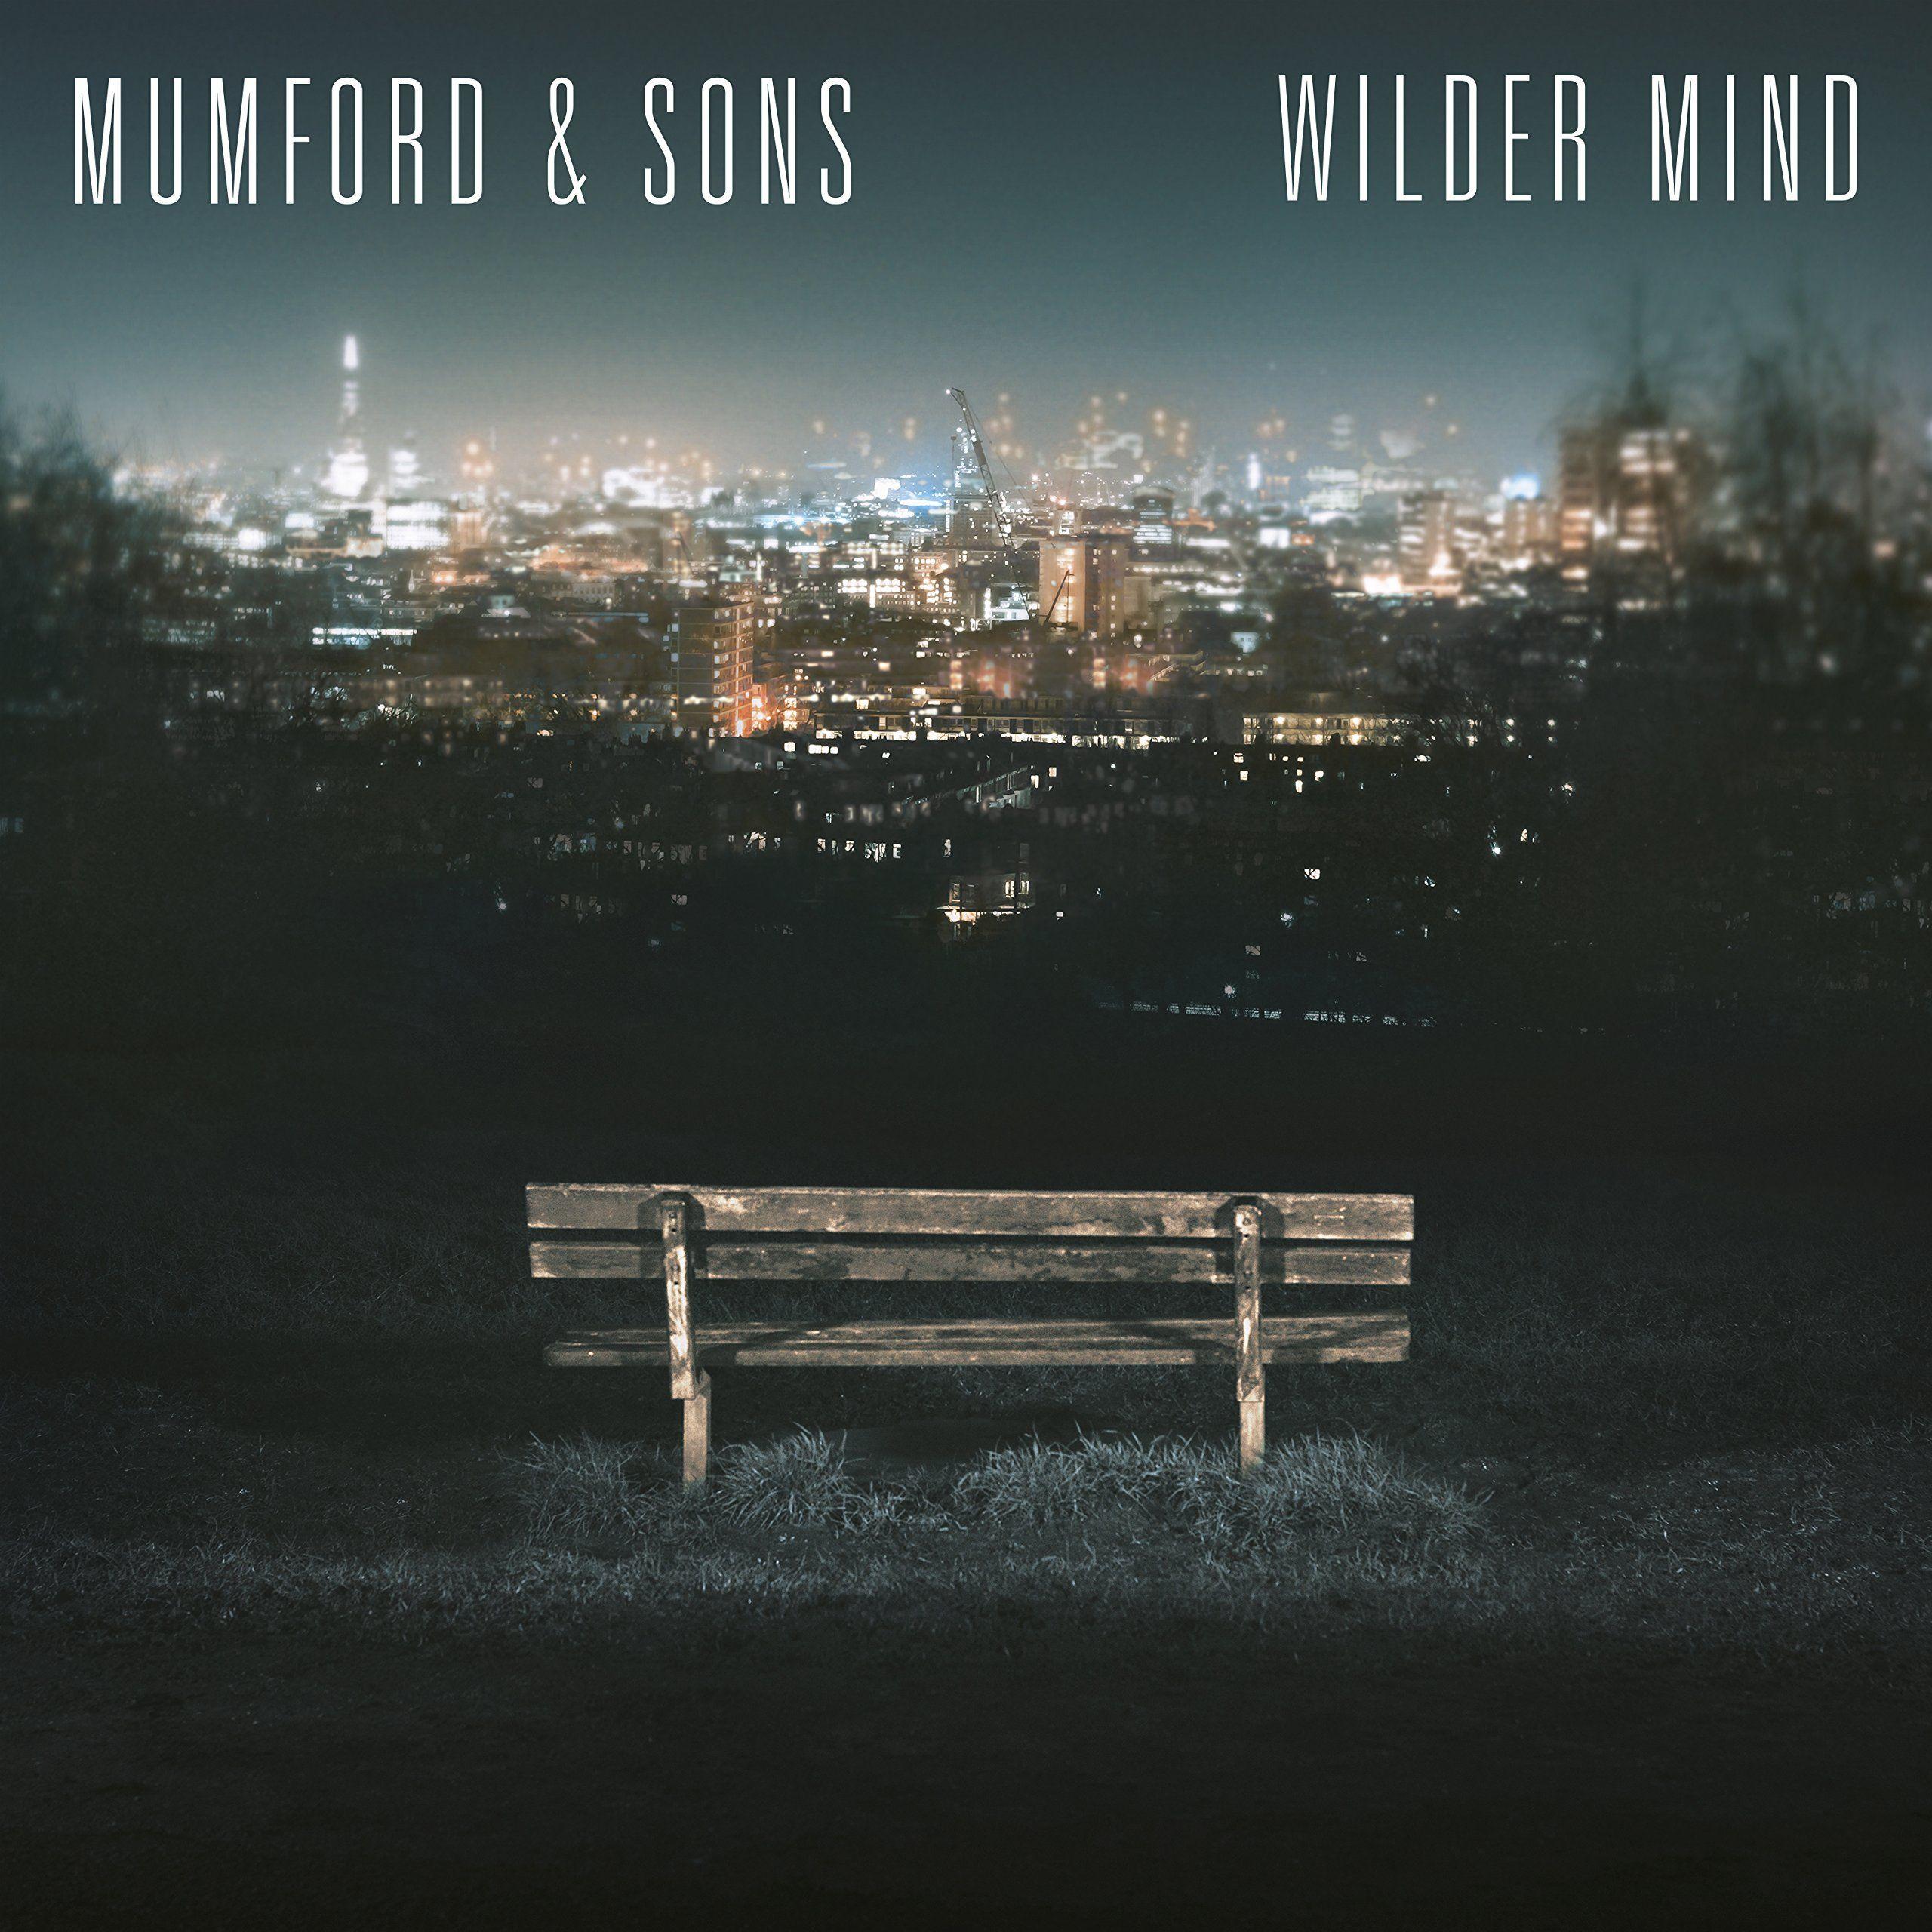 Mumford and Sons - Wilder Mind album cover